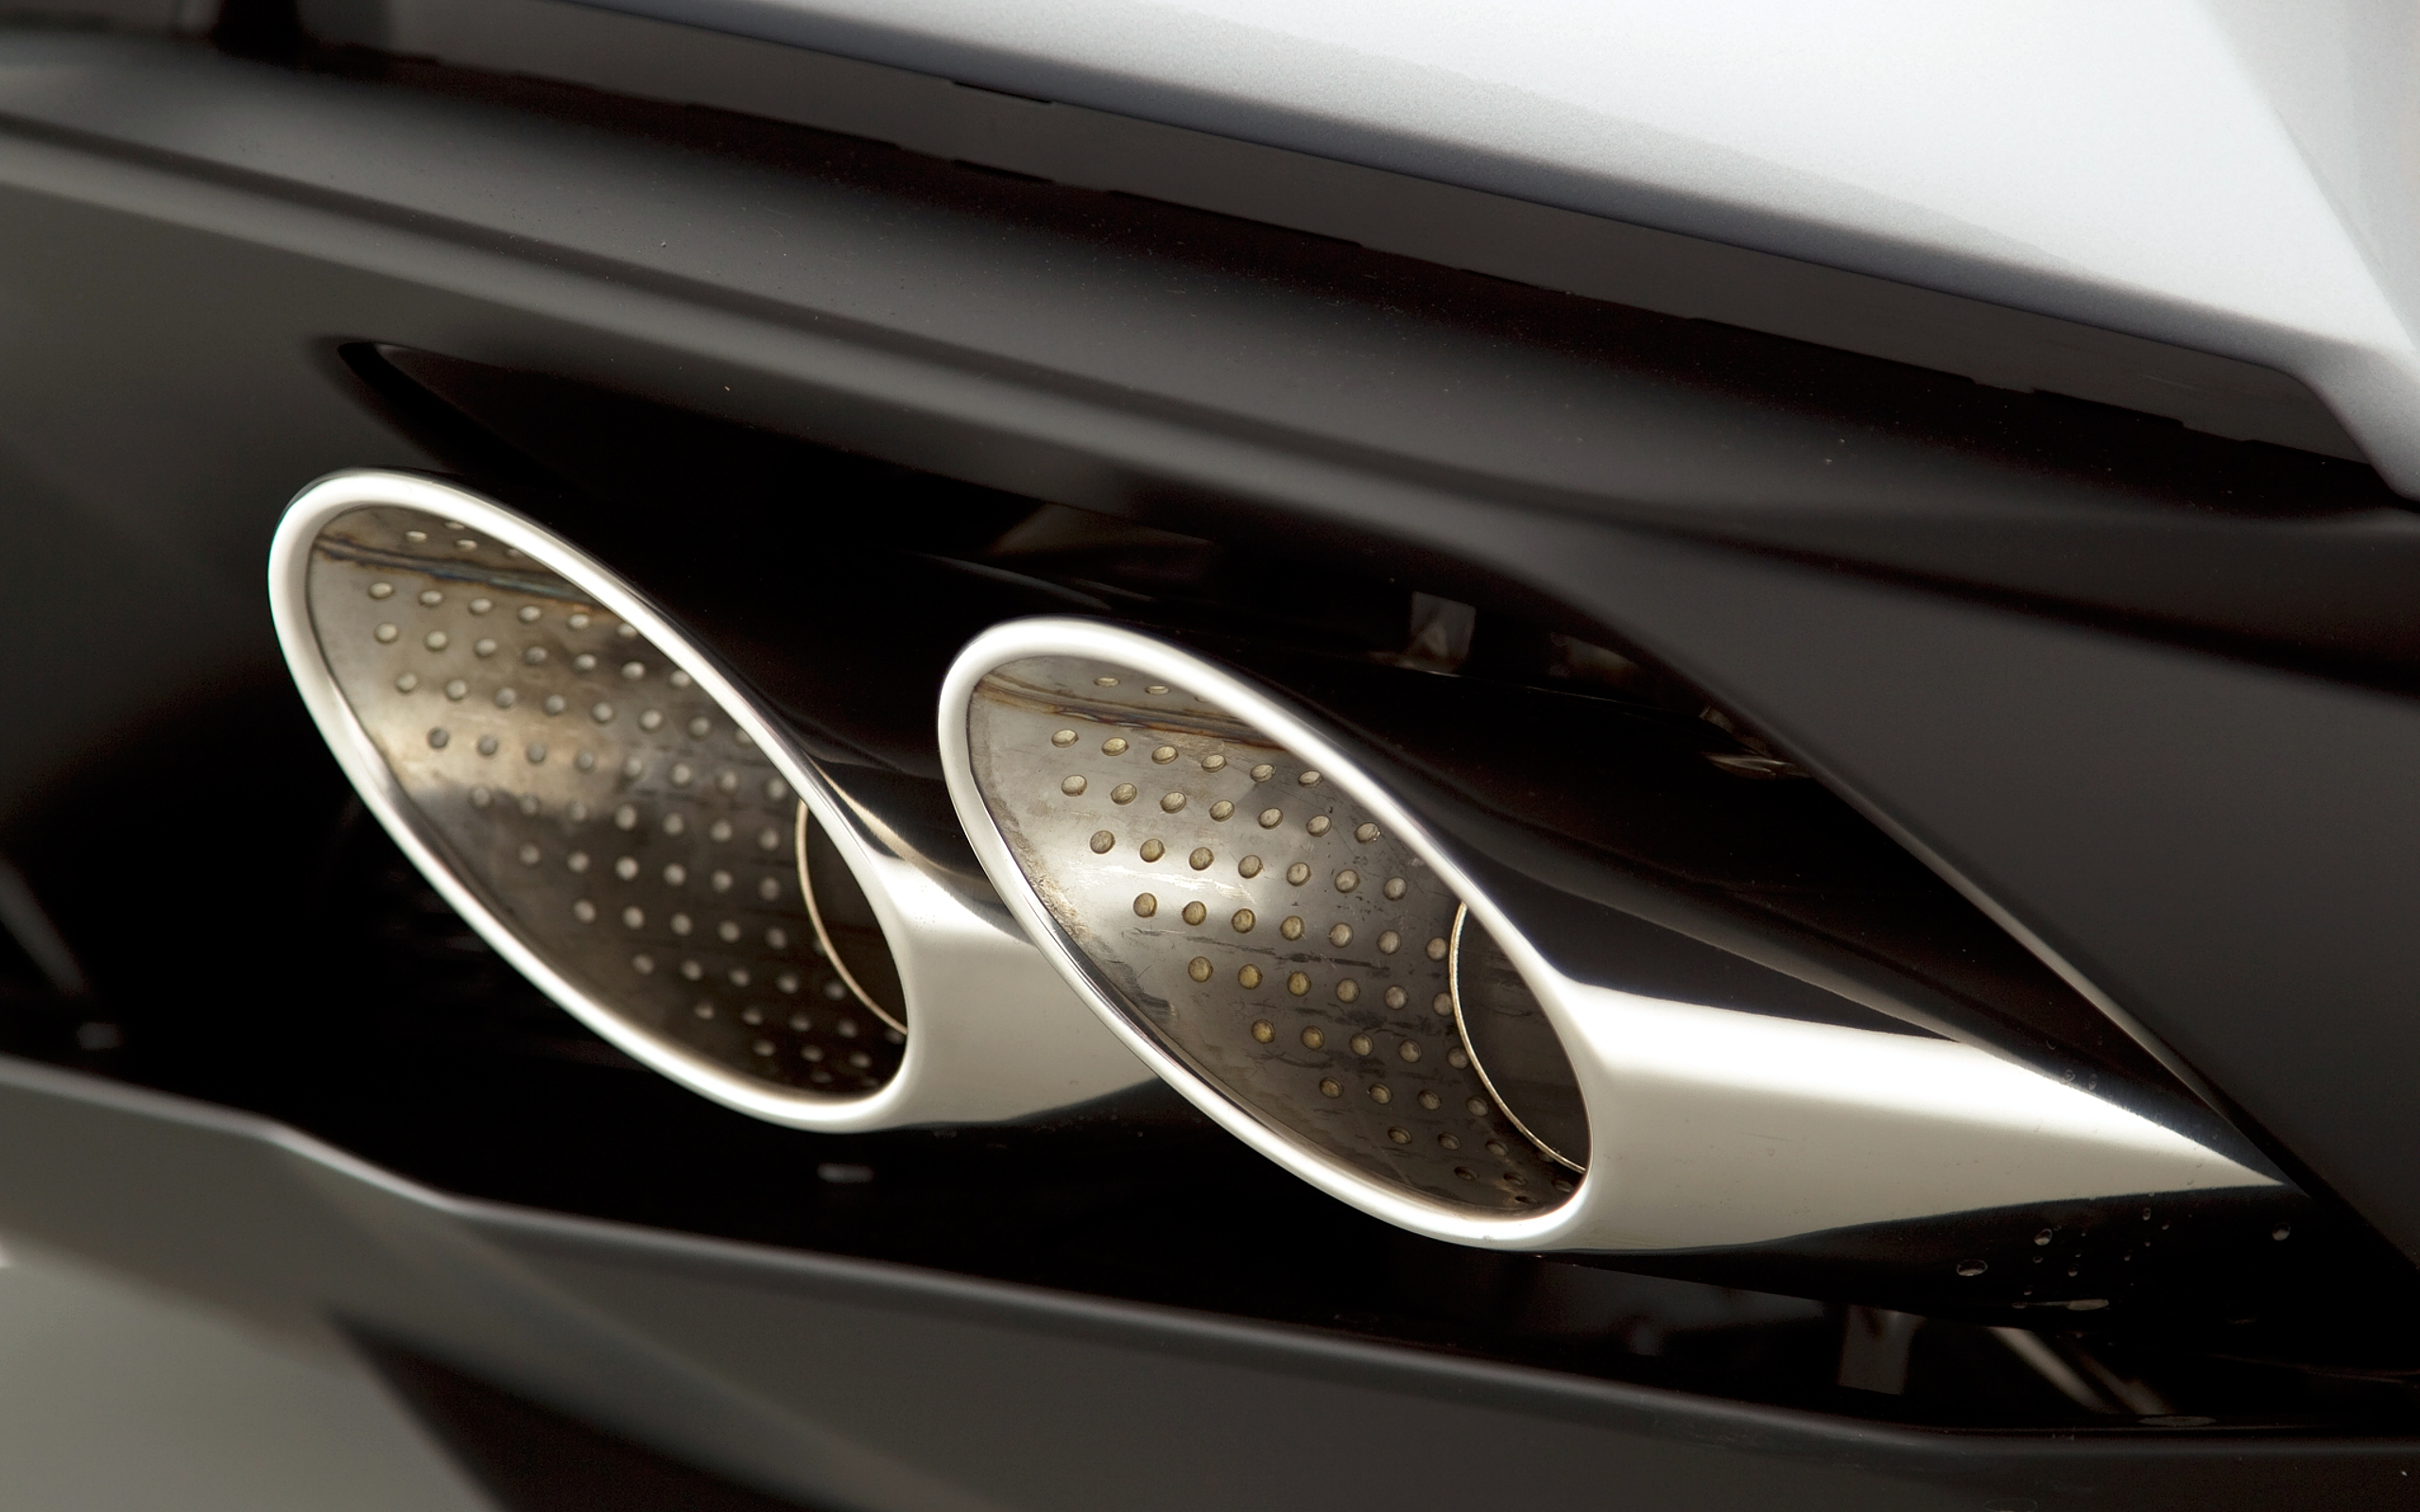 Car Lamborghini on HD wallpapers for desktopNew Lamborghini Huracan 2560x1600